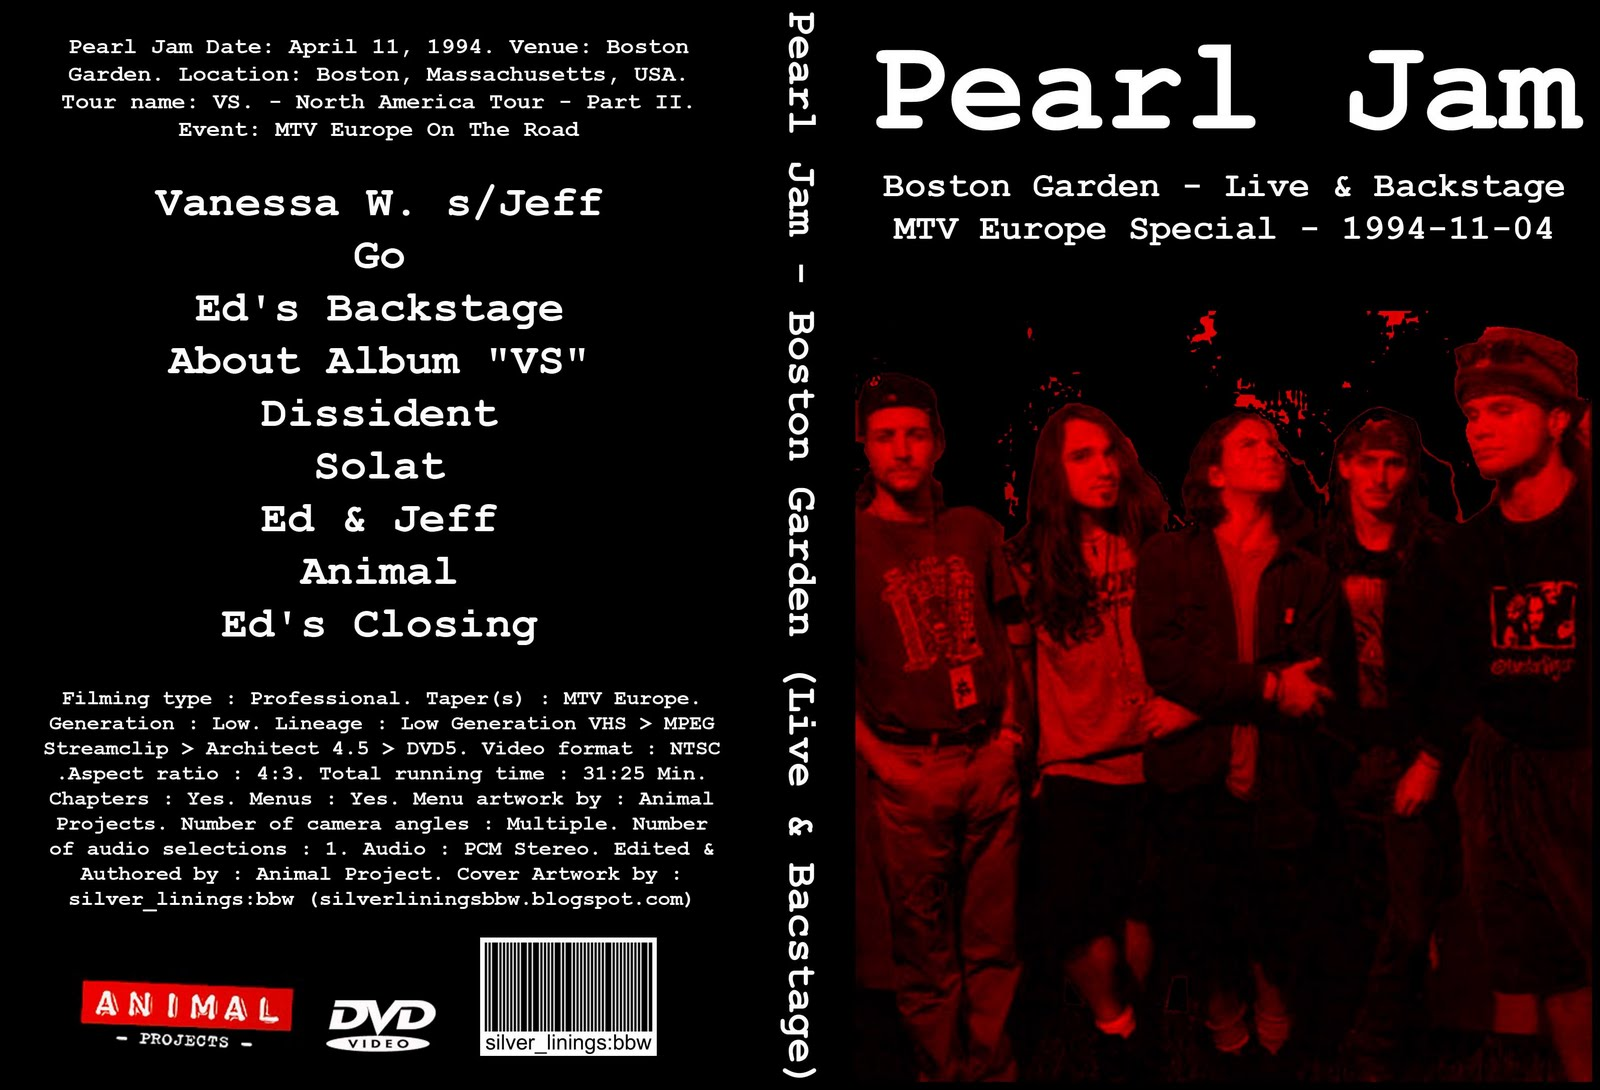 silver_linings:bbw: Pearl Jam - Boston Garden - Live & Backstage